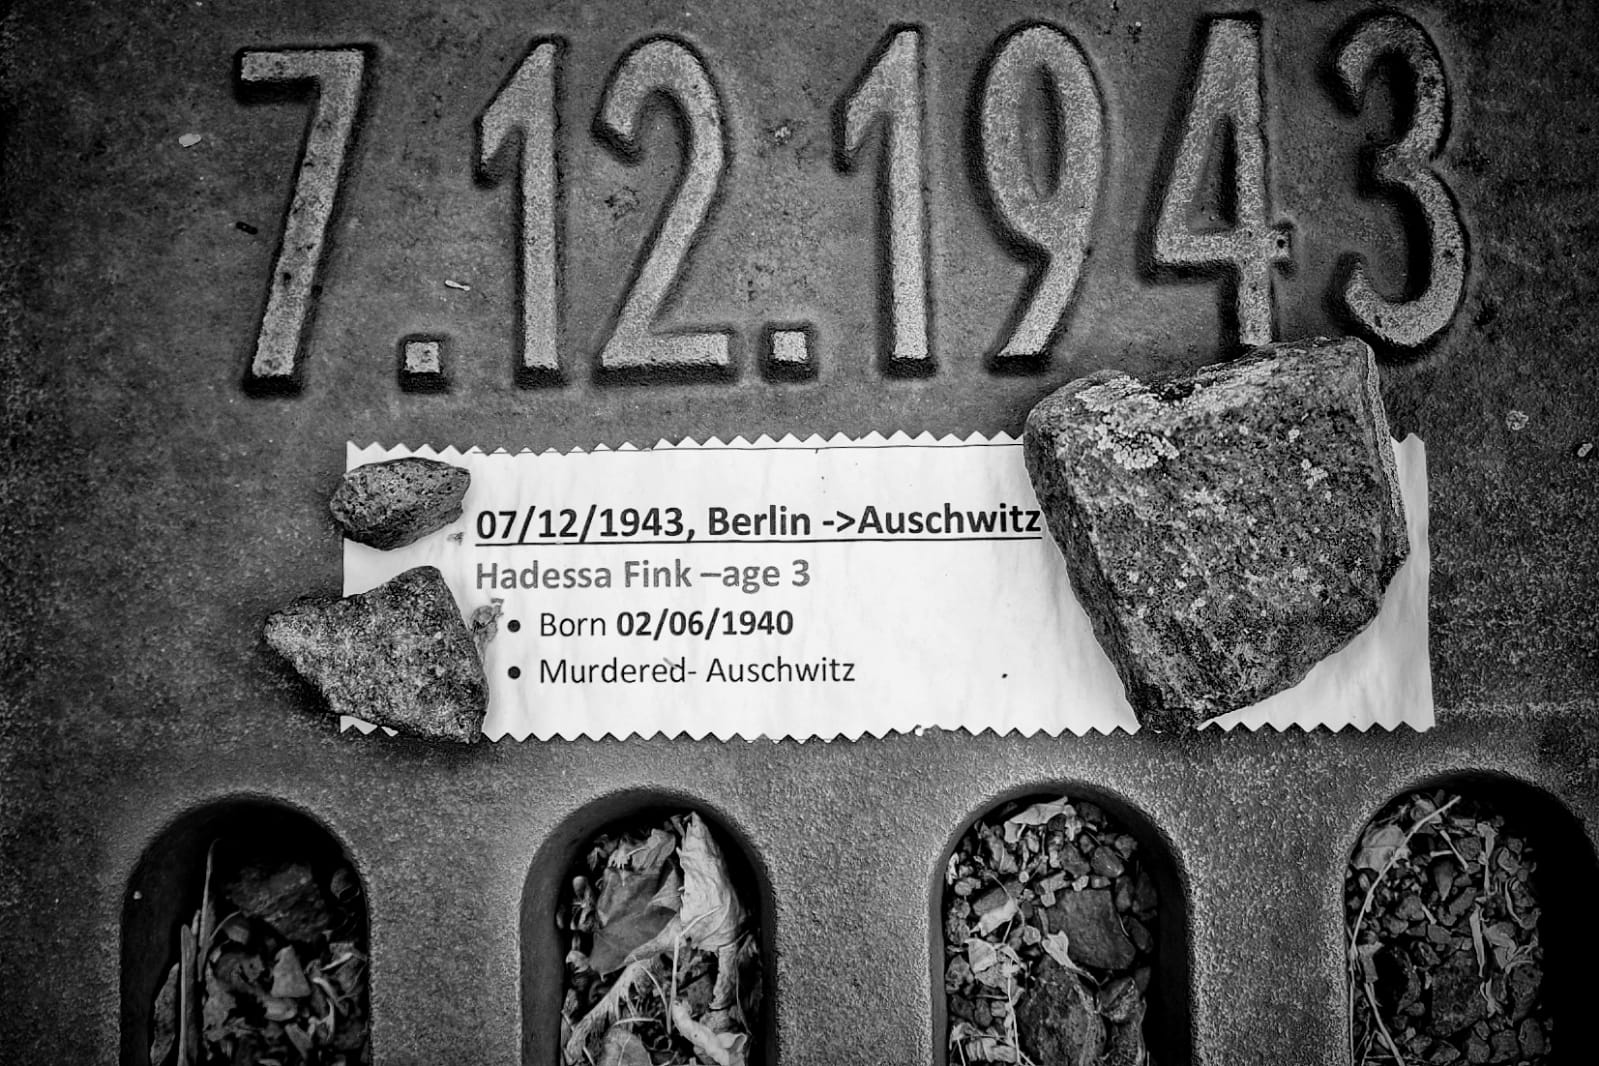 Track 17 - Berlin